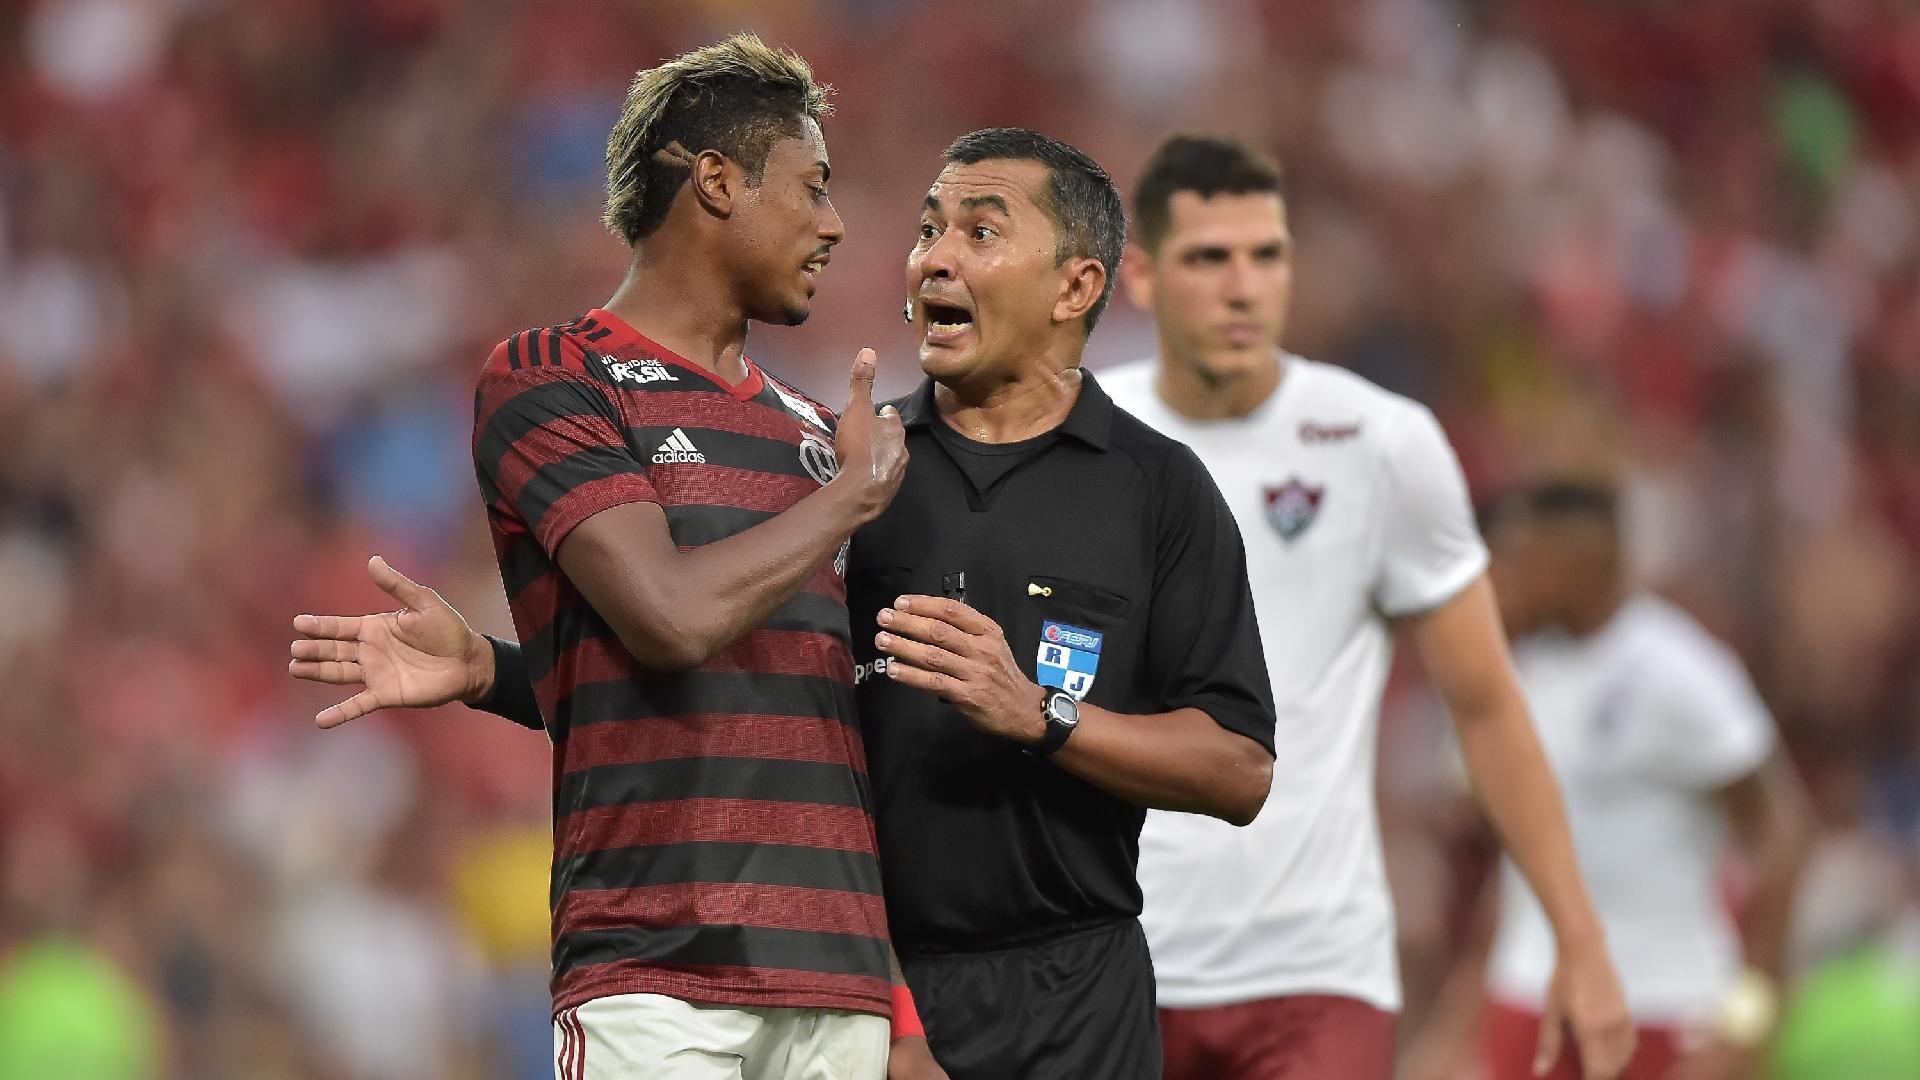 Bruno Henrique conversa com o árbitro durante Flamengo x Fluminense